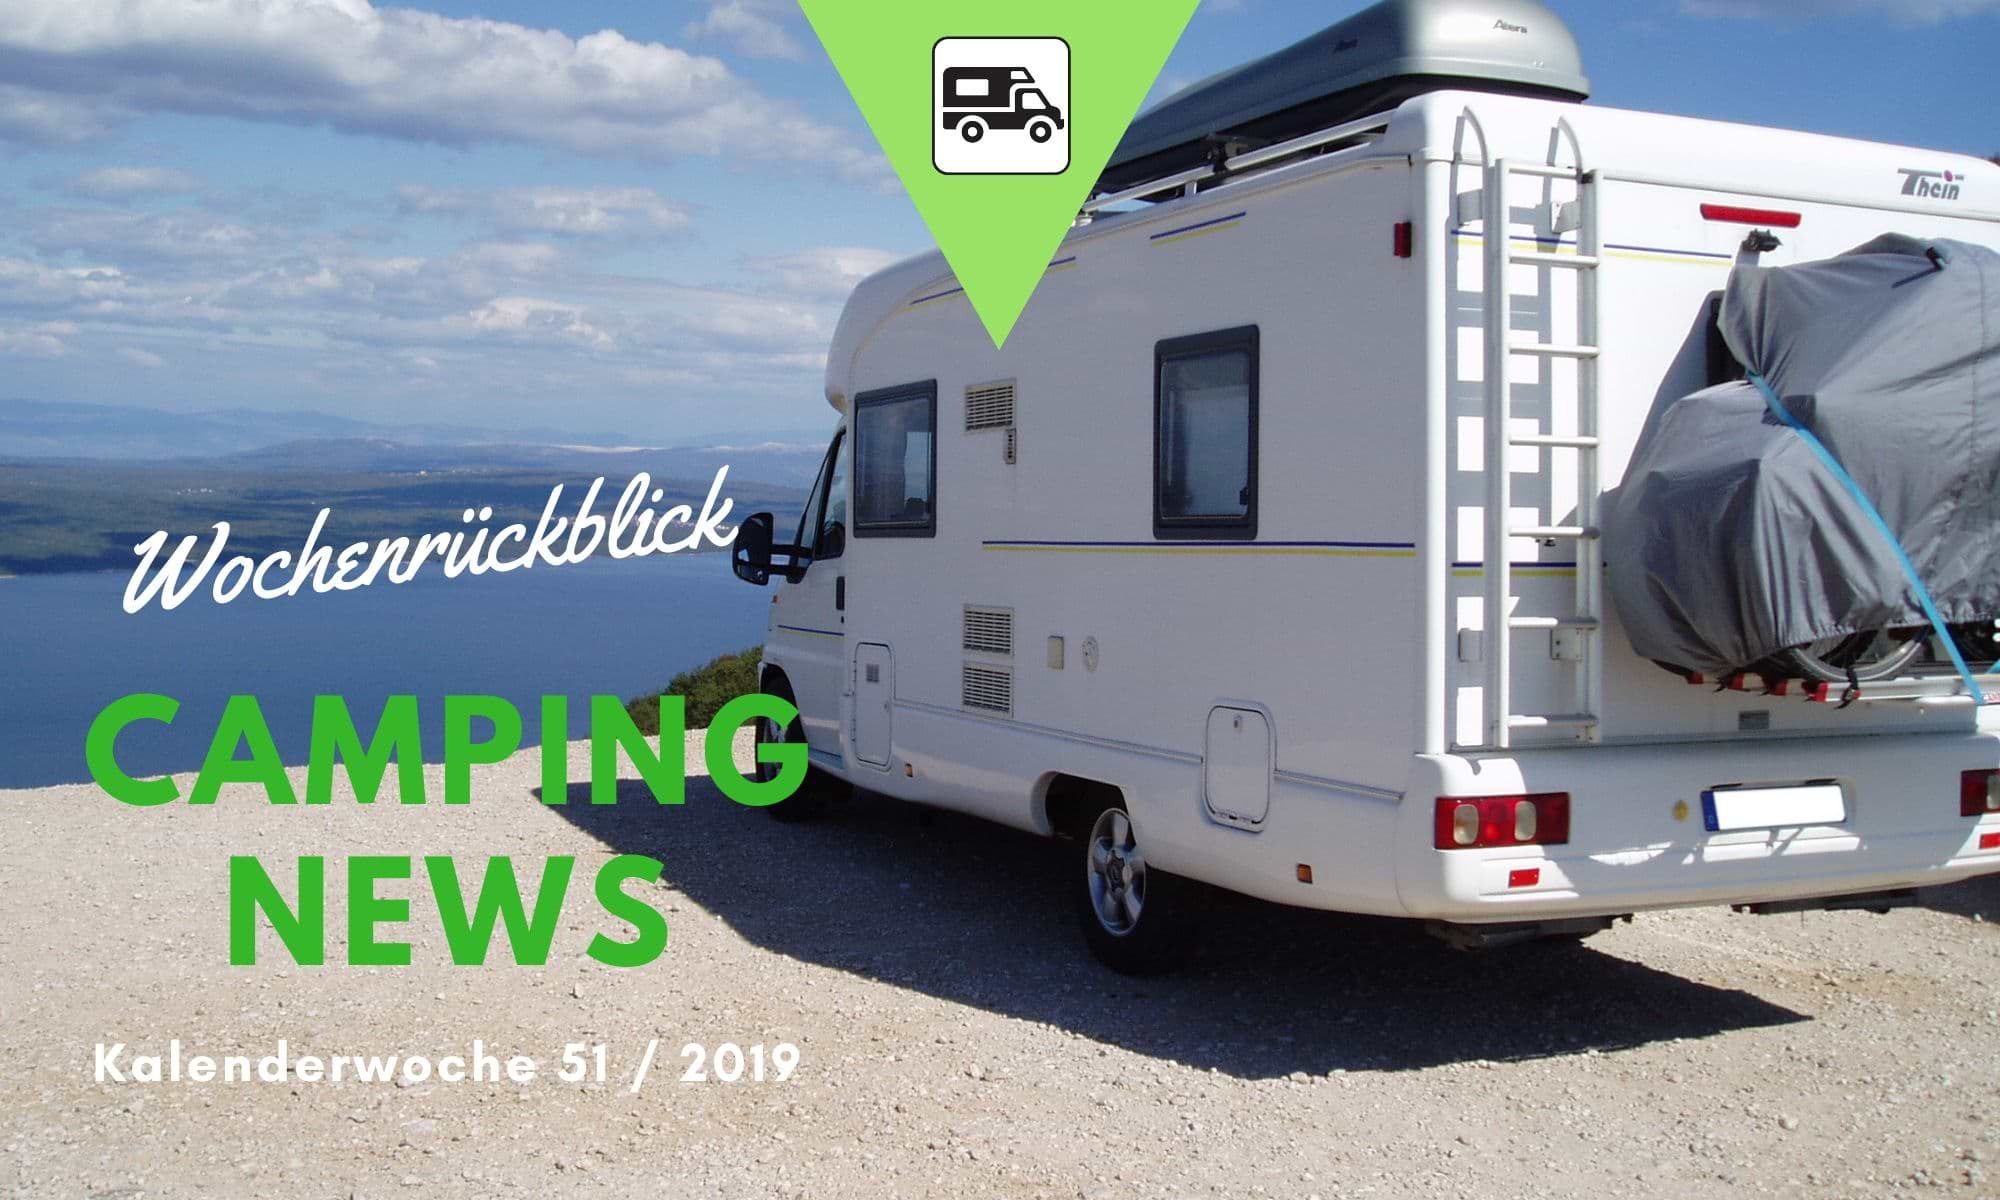 Wochenrückblick Camping News KW51-2019